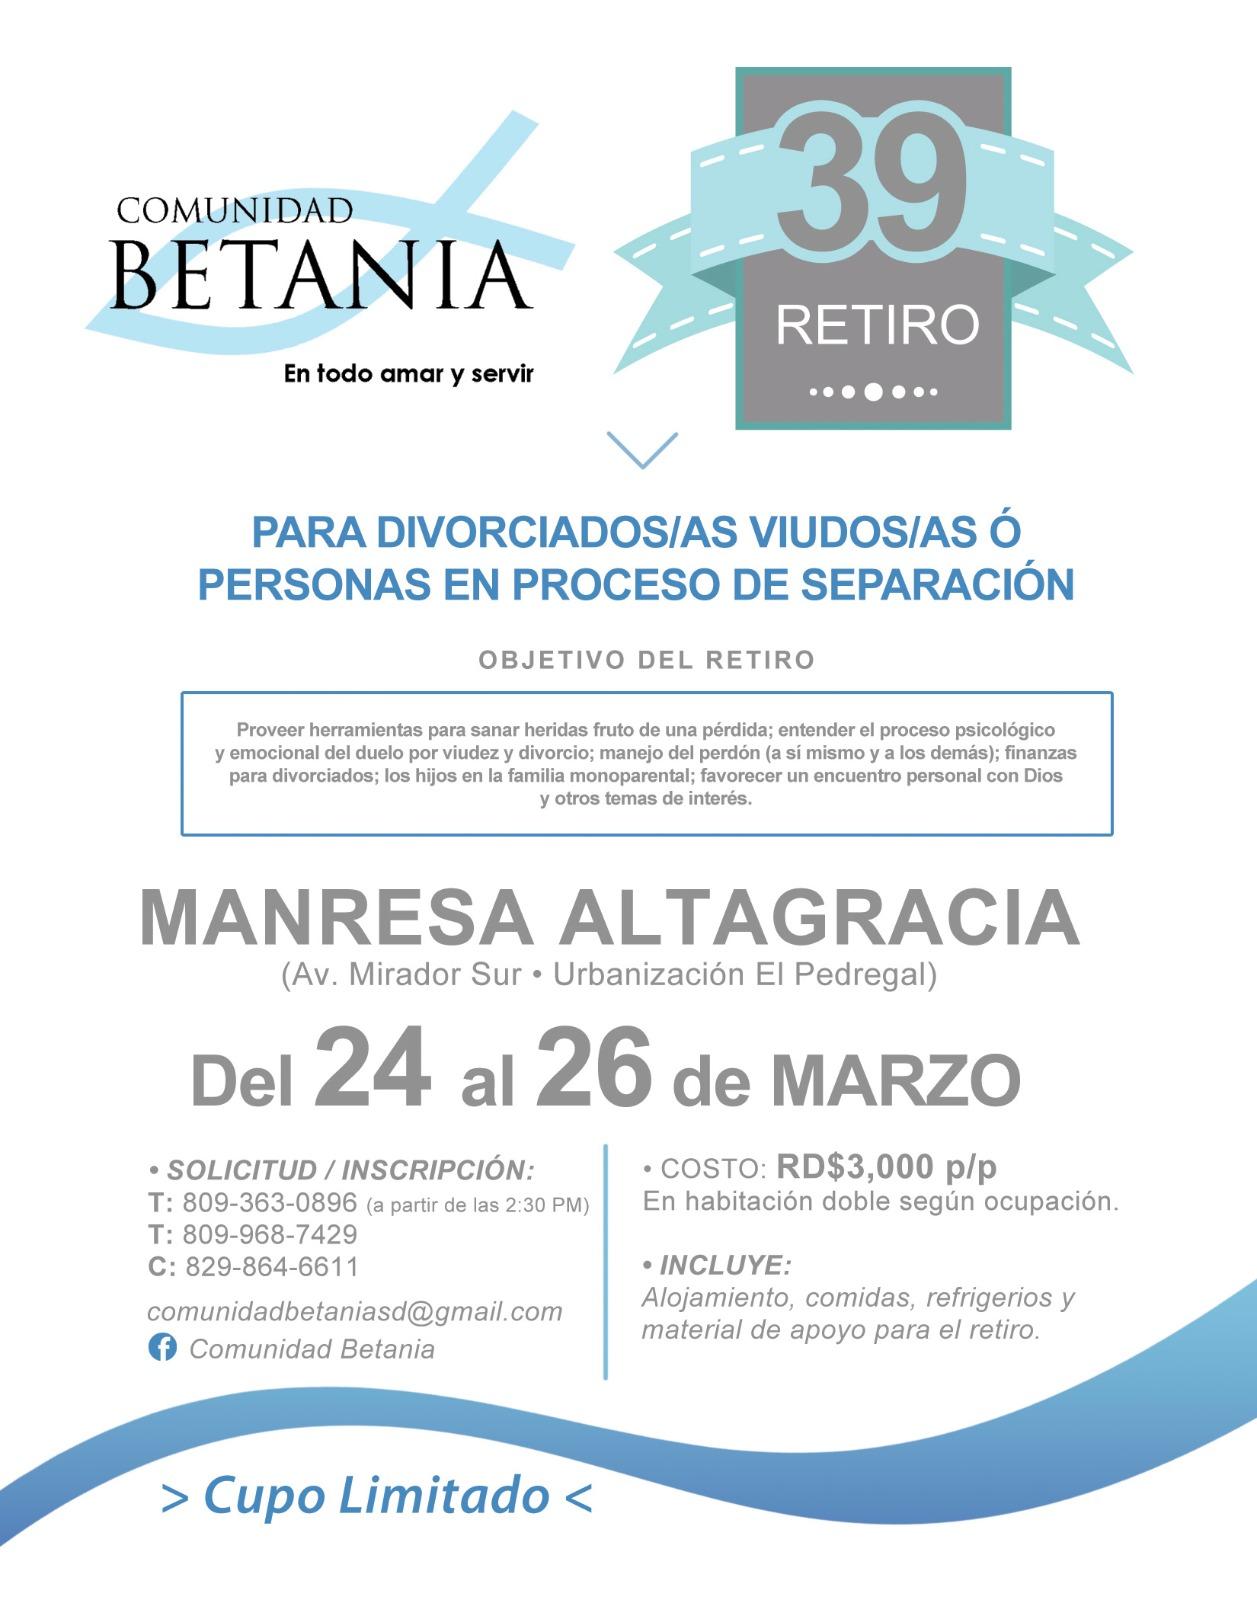 Comunidad Betania